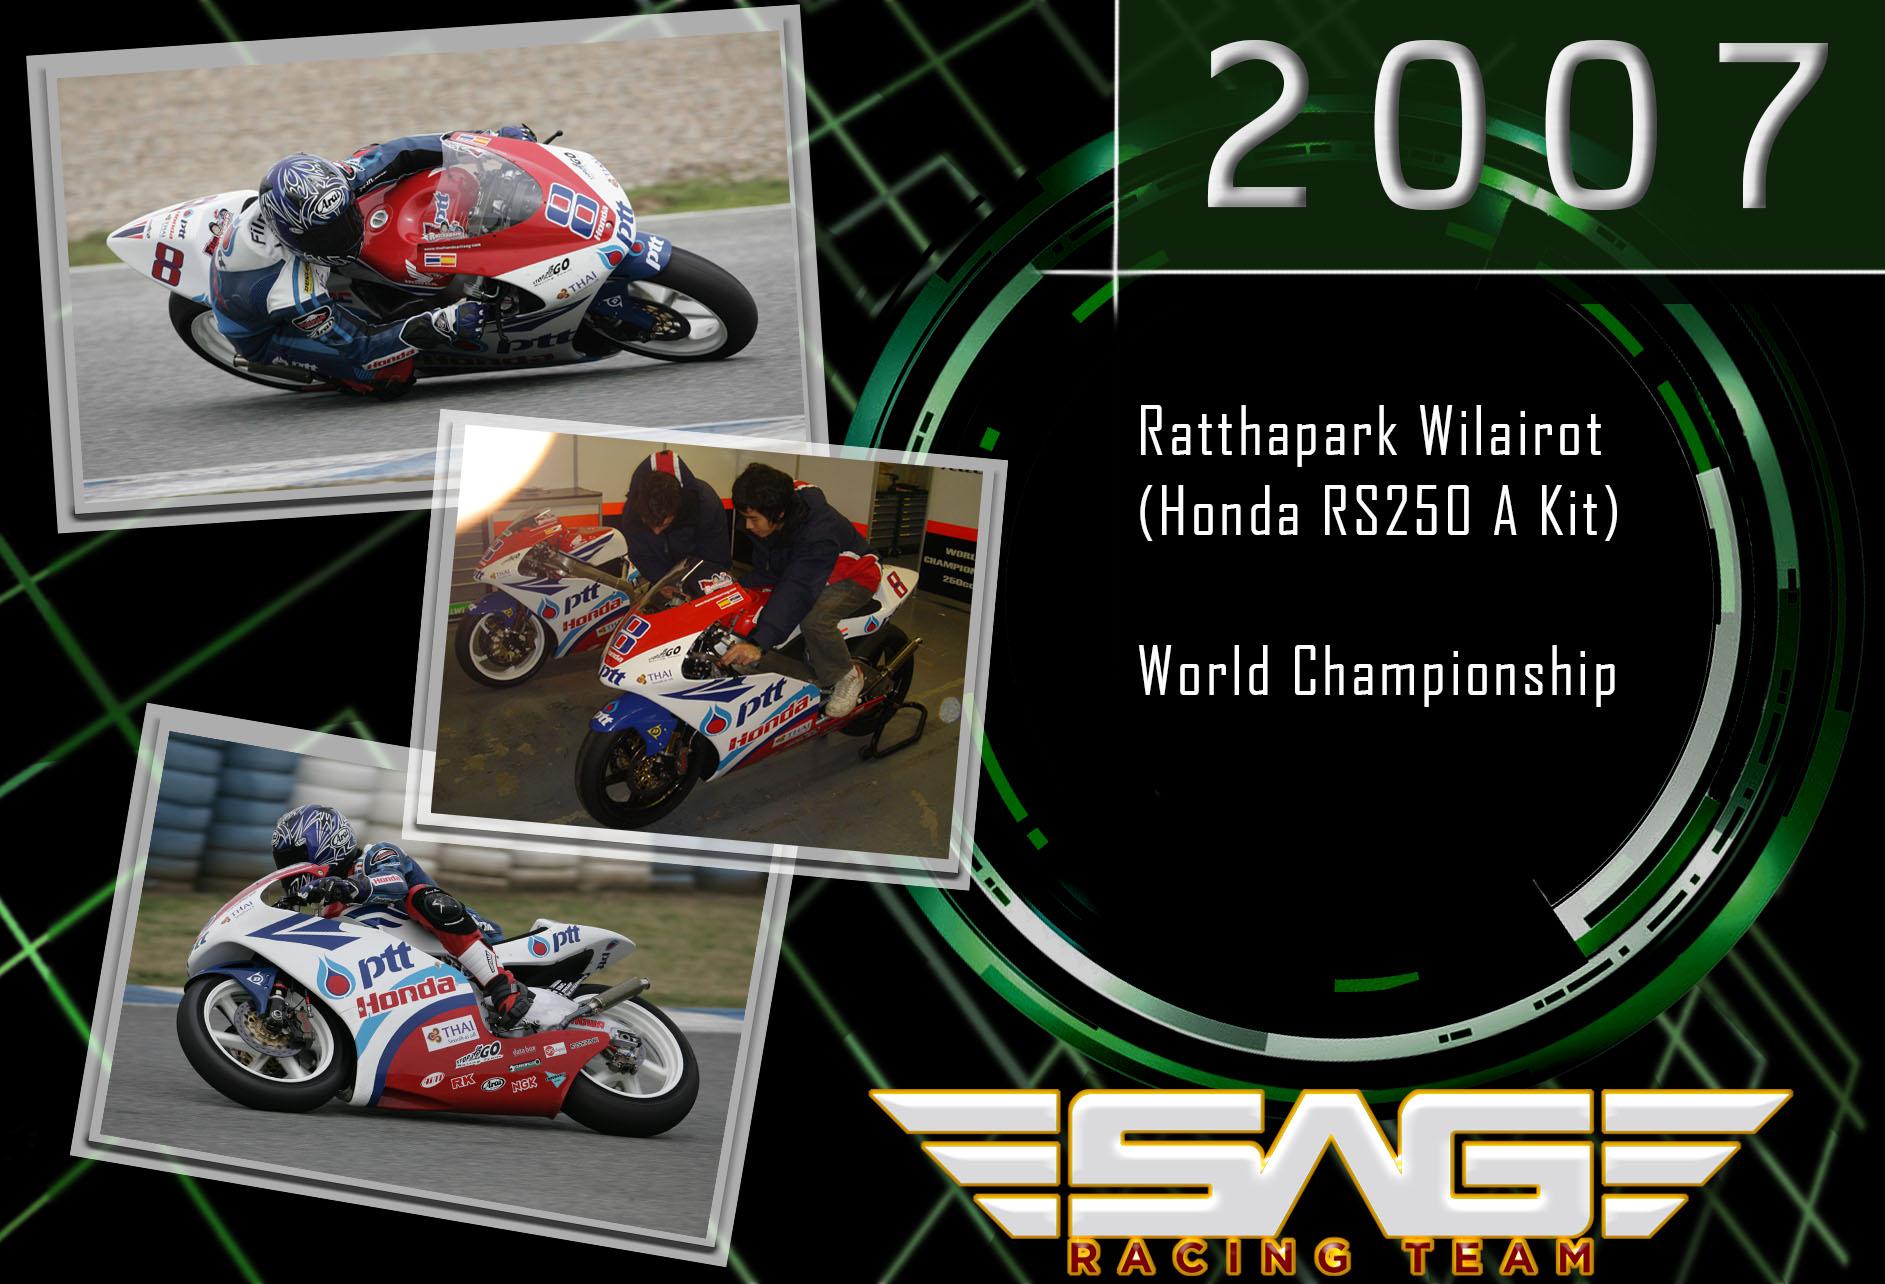 World Championship rider Ratthapark Wilairot (250cc)